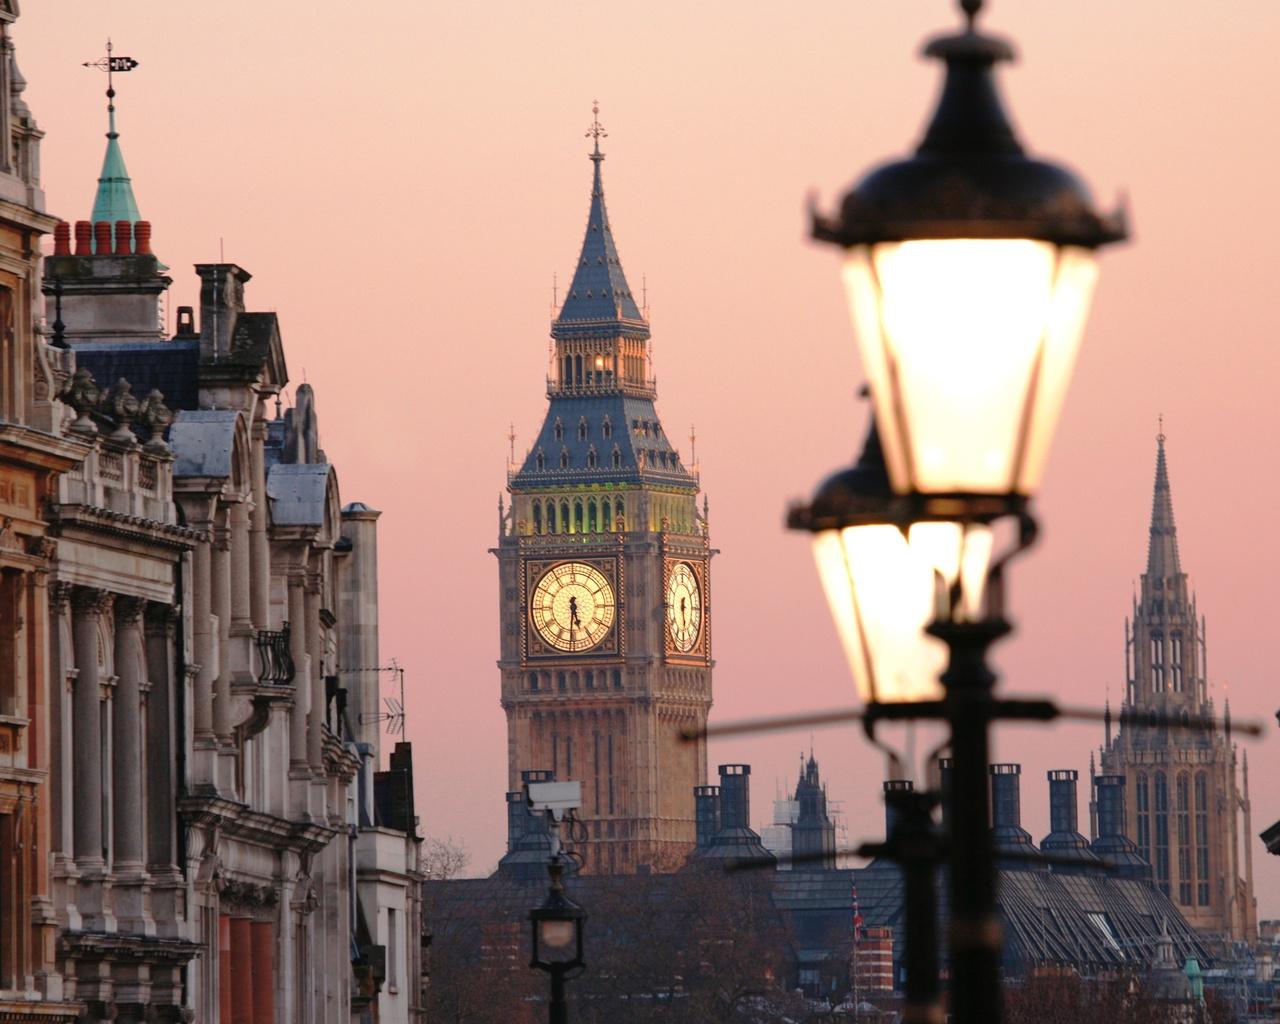 биг-бен, england, лондон, great britain, big ben, London, англия